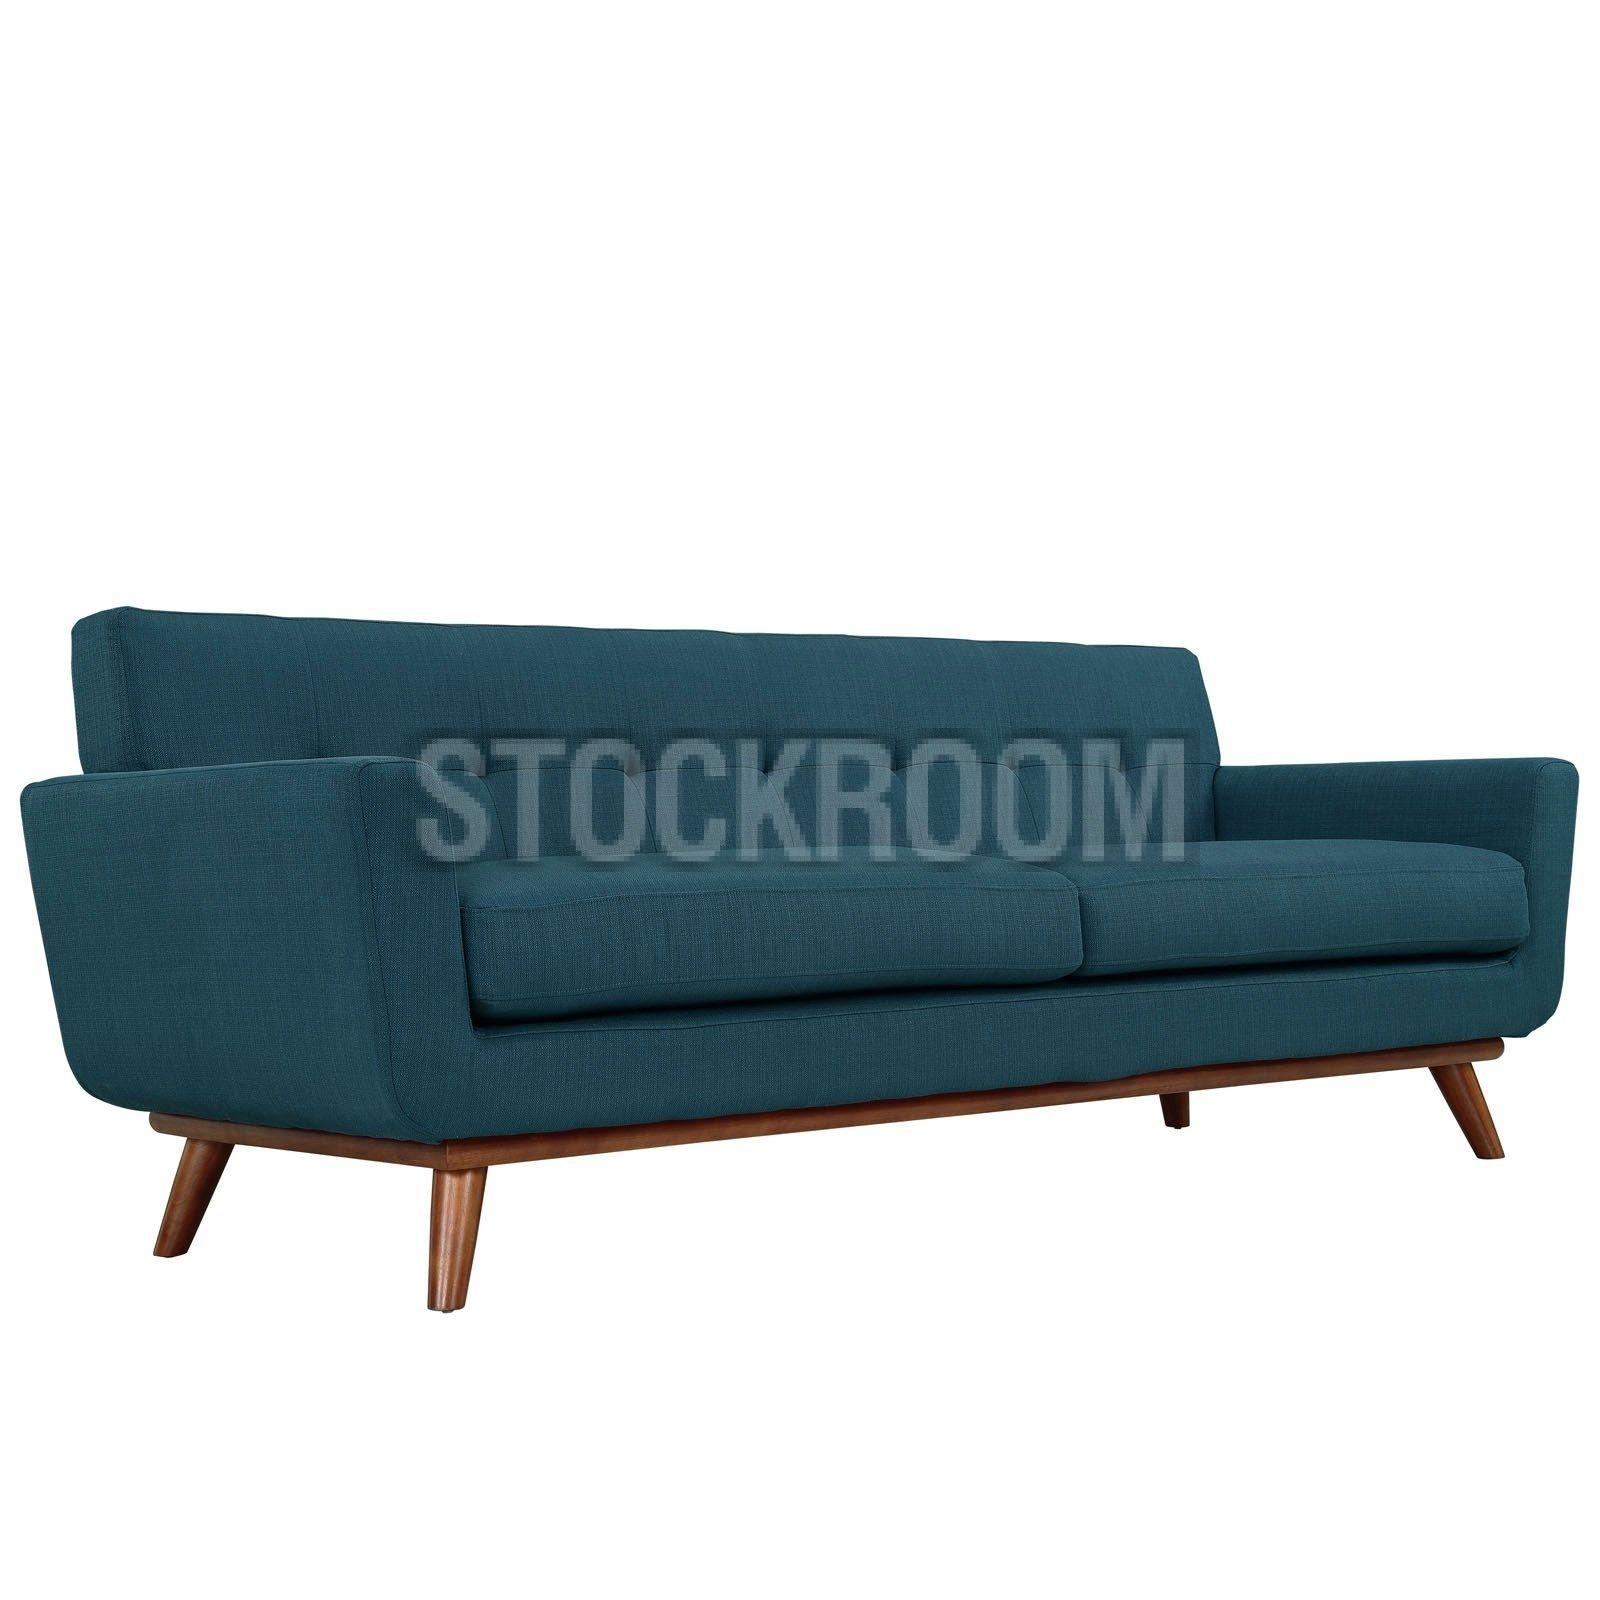 Aquarius Fabric Sofa 2 Seater : Stockroom Hong Kong Contemporary With Regard To Aquarius Dark Grey Sofa Chairs (View 7 of 20)